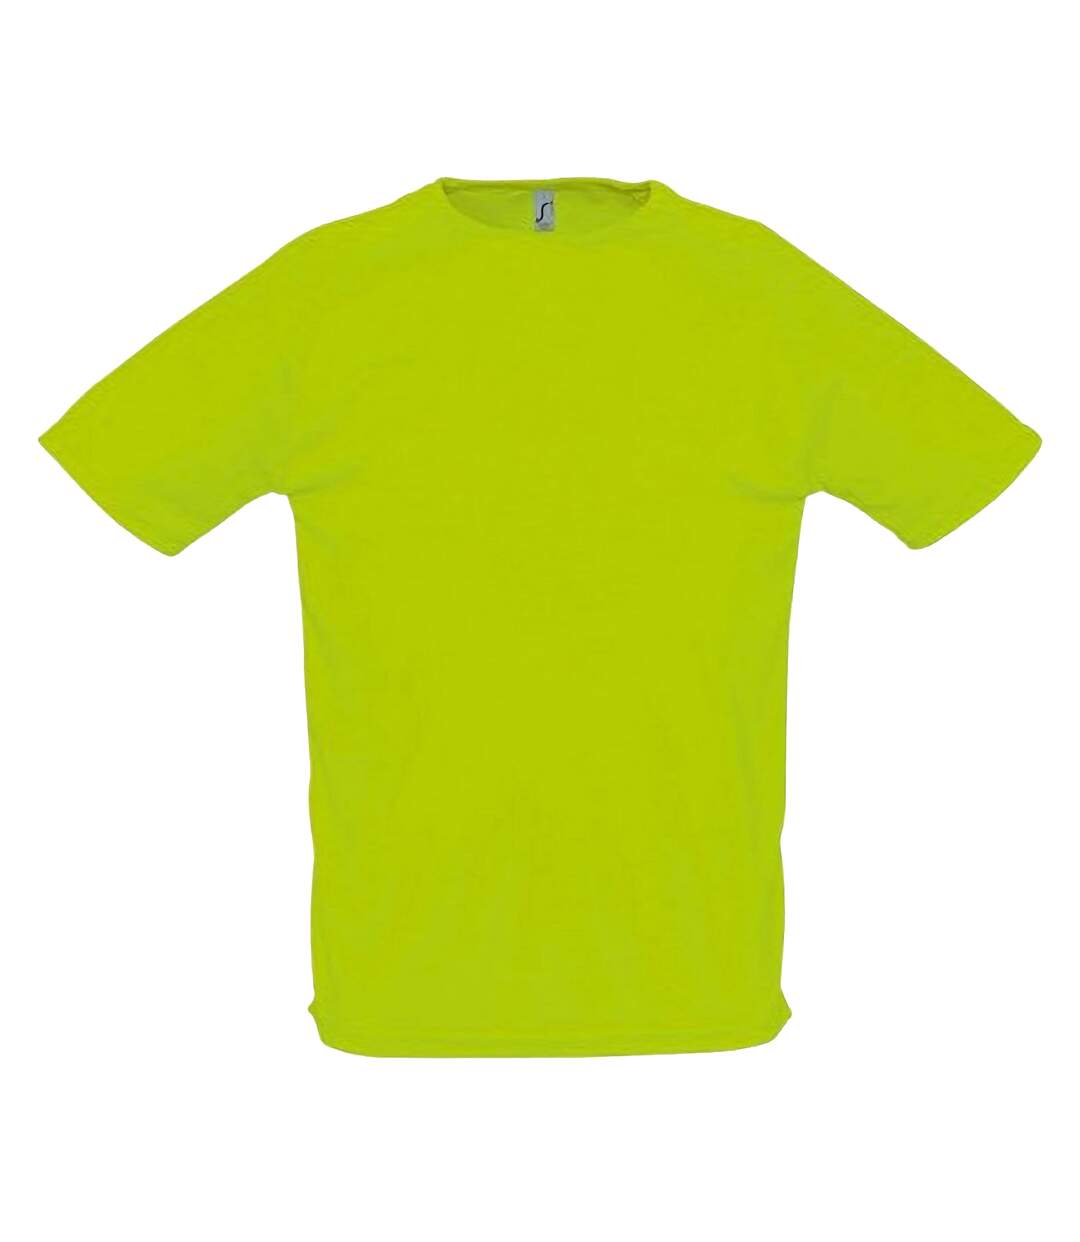 SOLS Mens Sporty Short Sleeve Performance T-Shirt (Neon Green) - UTPC303